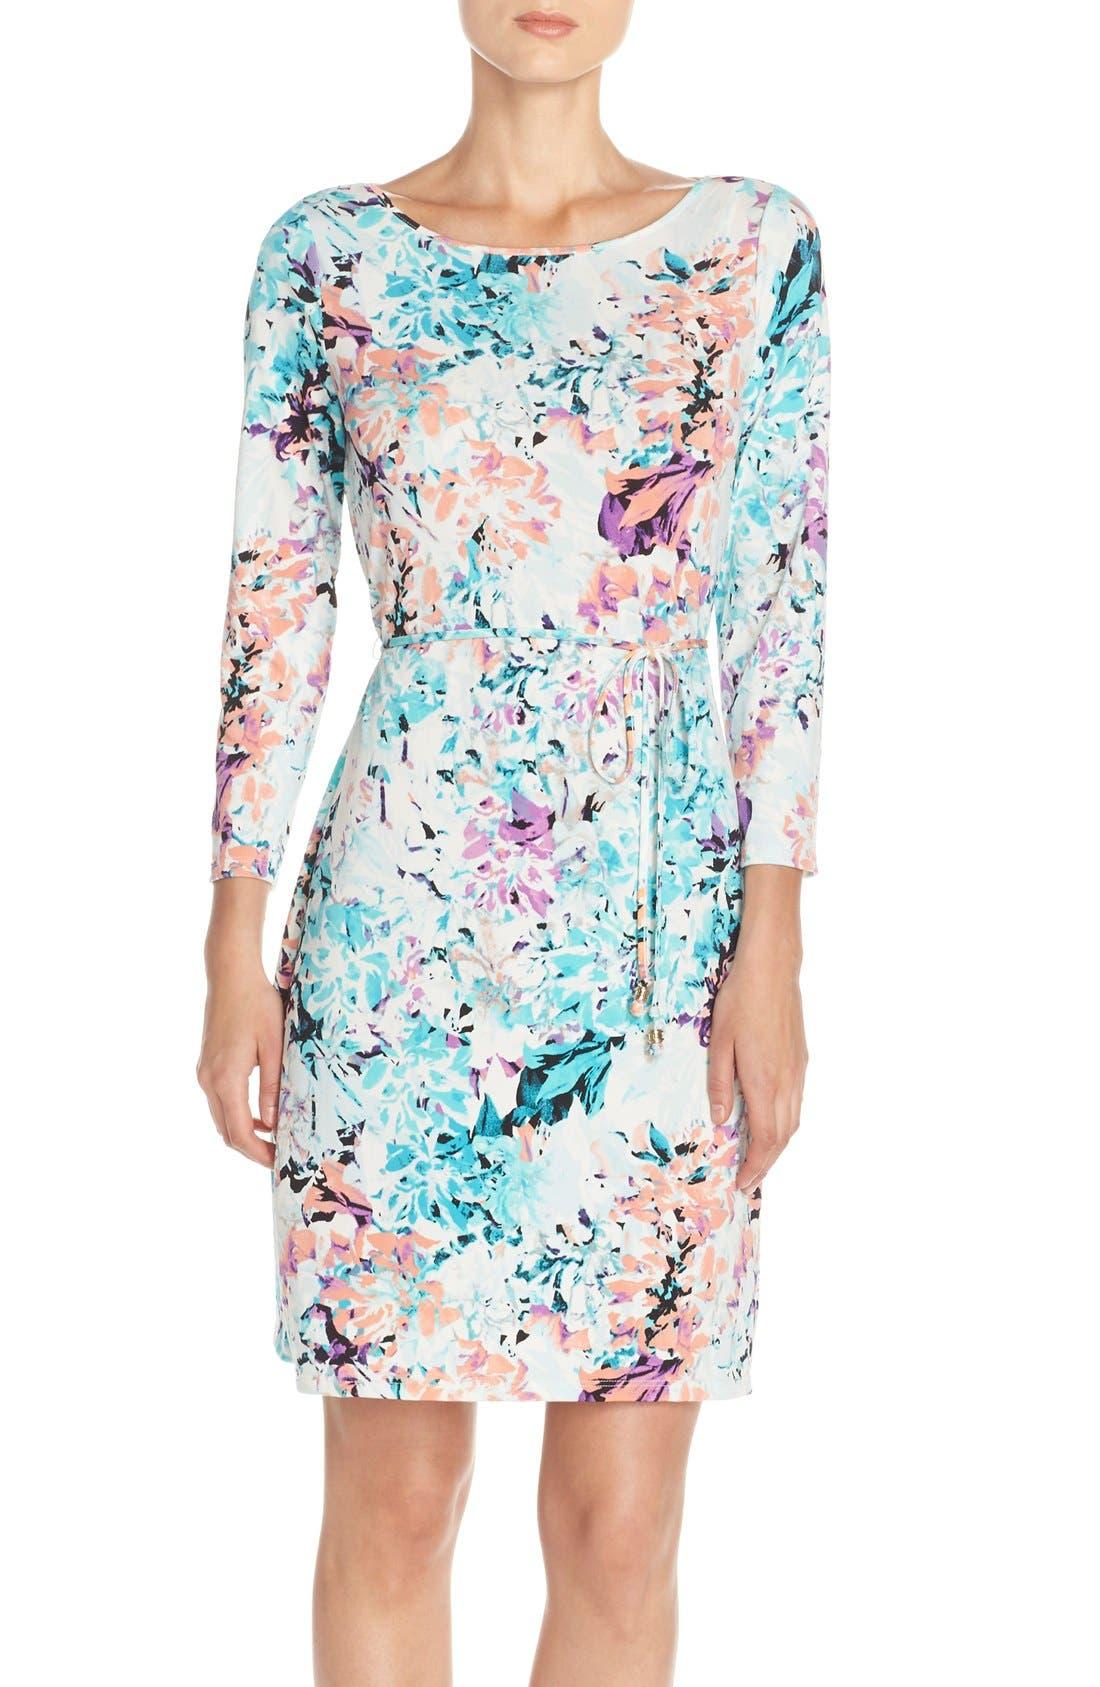 IVANKA TRUMP, Floral Print Jersey A-Line Dress, Main thumbnail 1, color, 101